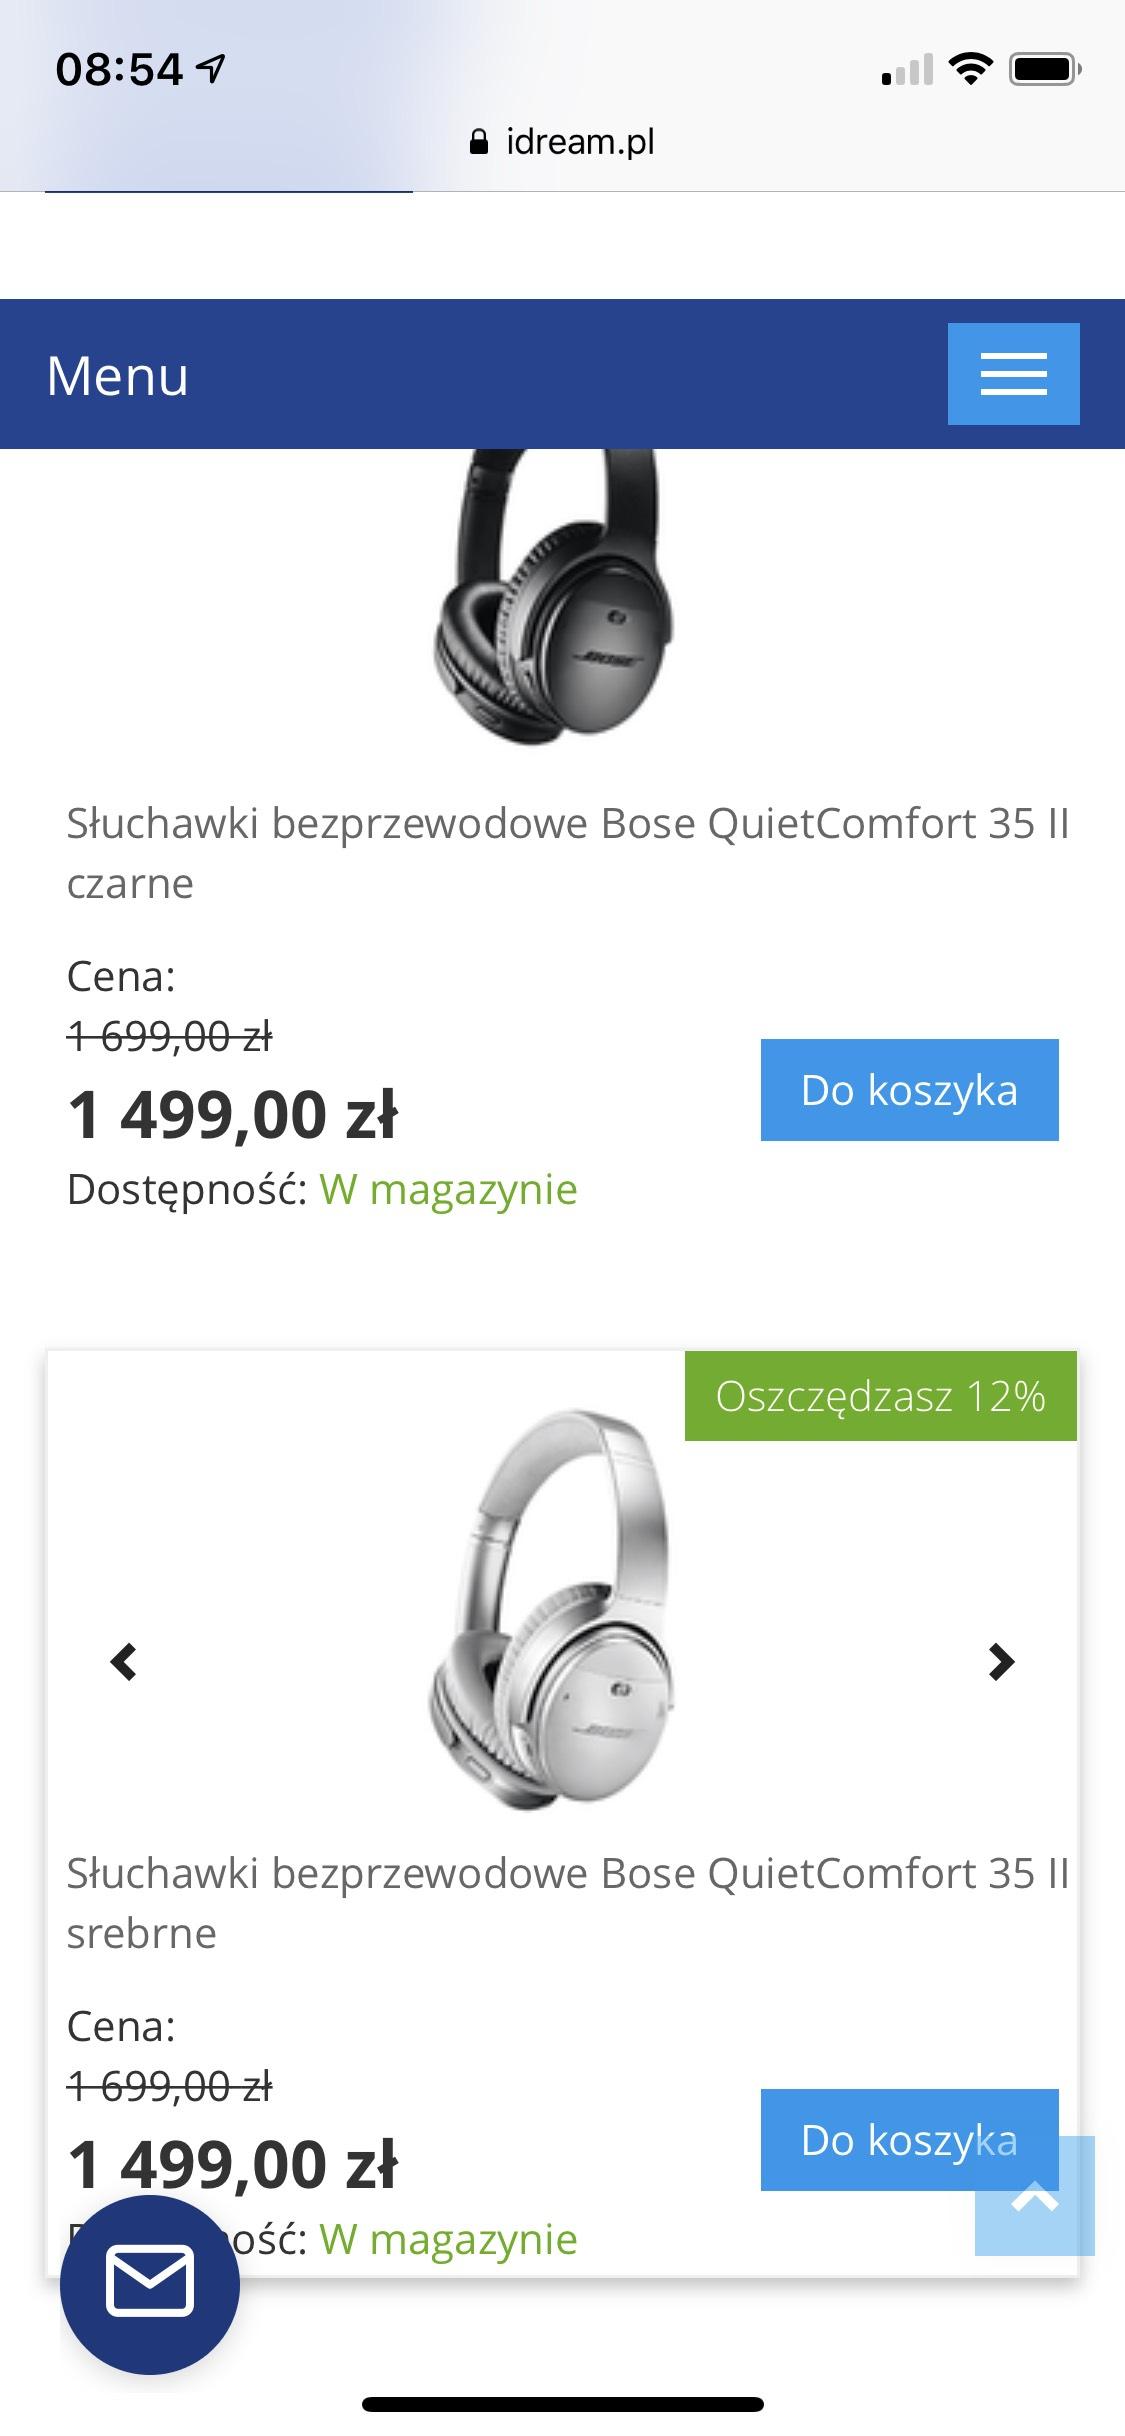 Słuchawki bezprzewodowe Bose QuietComfort 35 II iDream